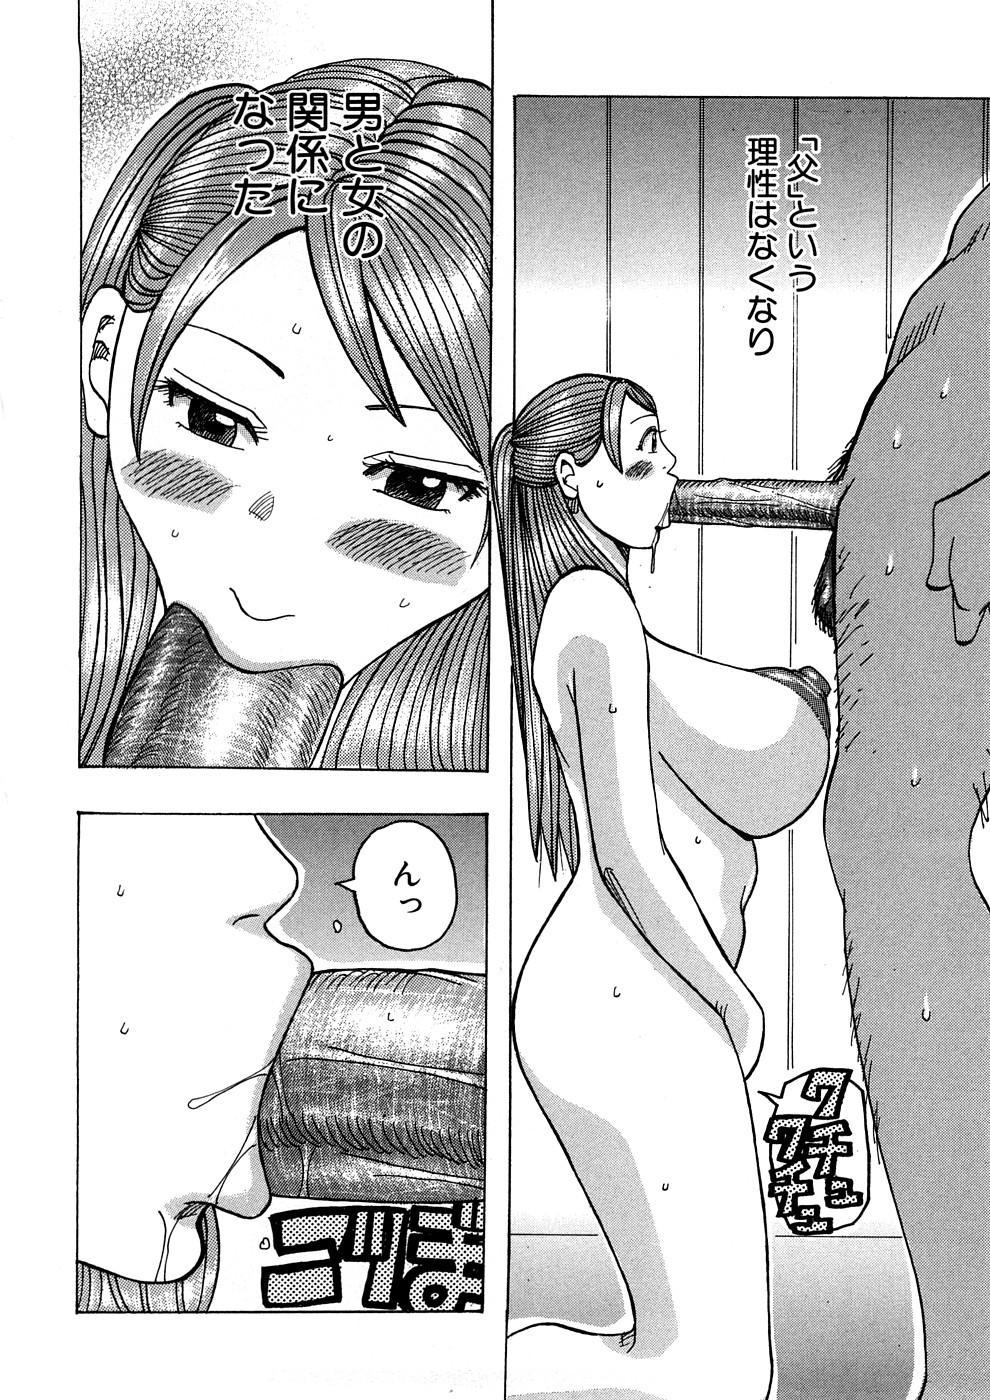 Geki Yaba Anthology Vol. 1 - Naka ni Dashite yo 94